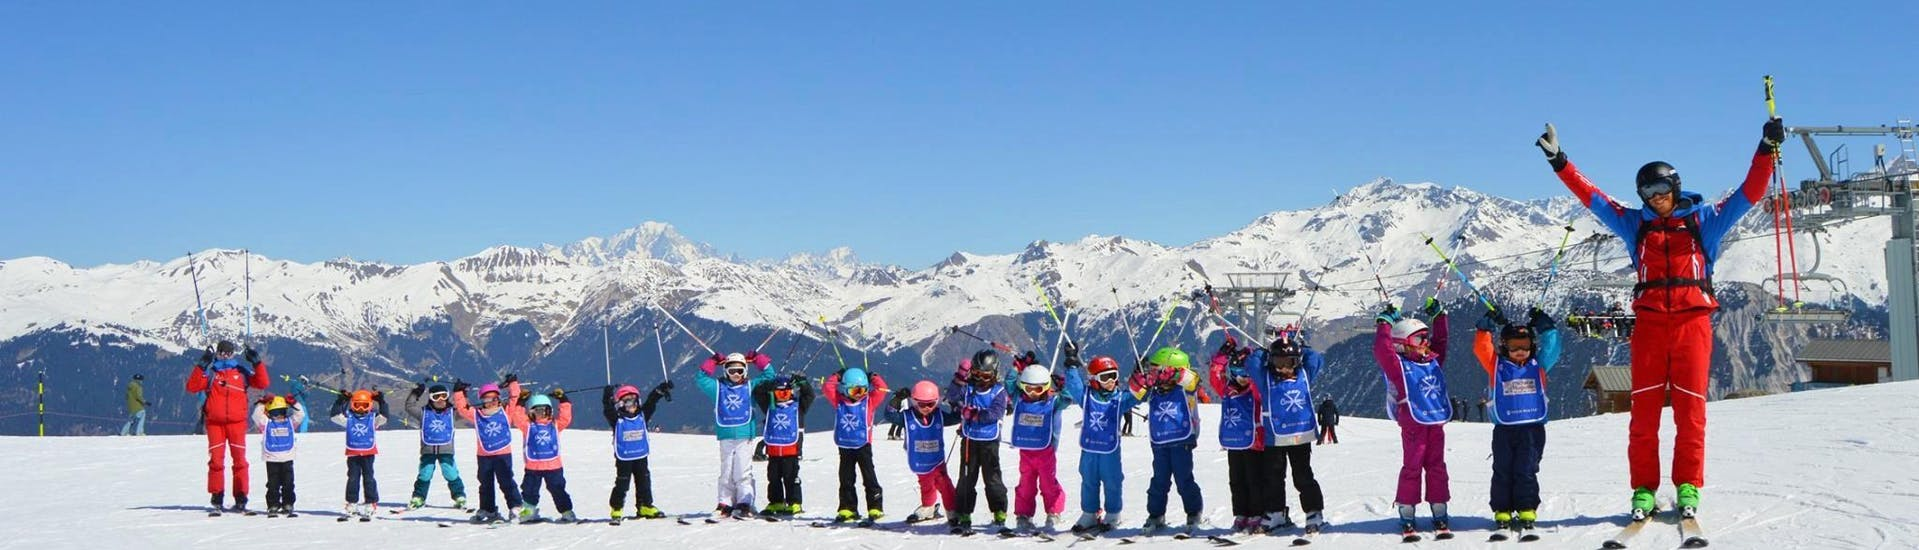 kids-ski-lessons-esf-courchevel-village-hero